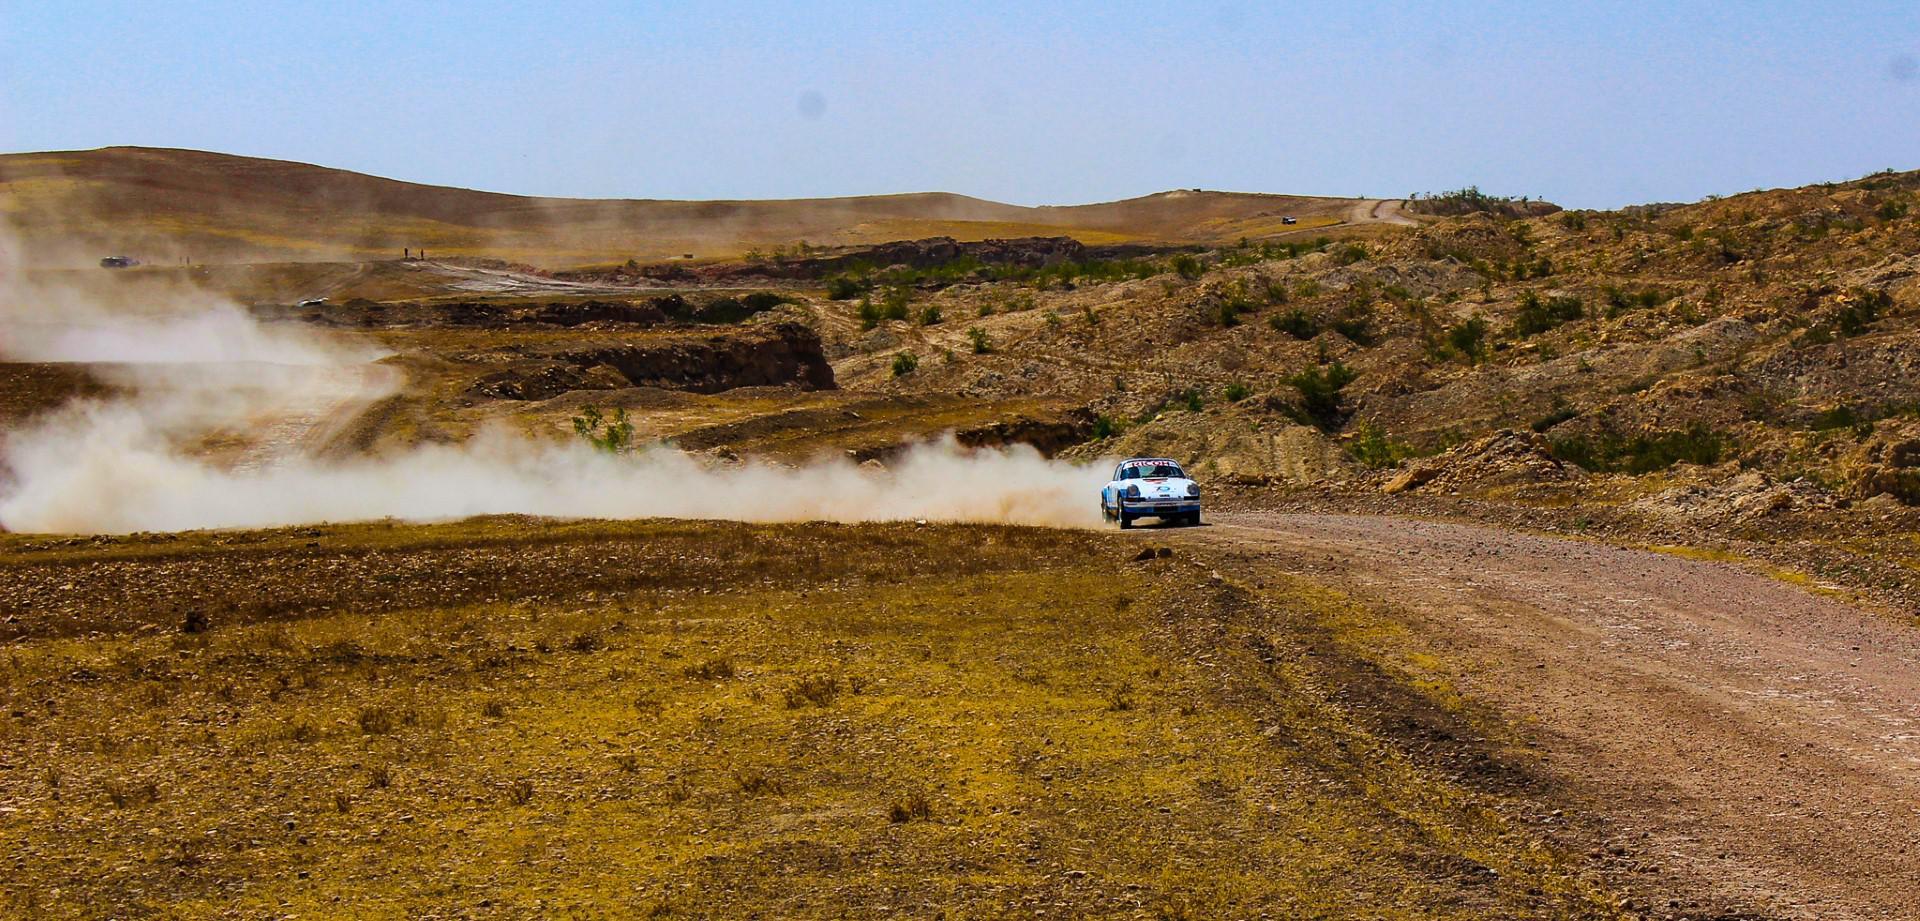 maroc-historic-rally-mhr-2018-changement-de-leader-a-1-jour-de-la-fin-826-2.jpg